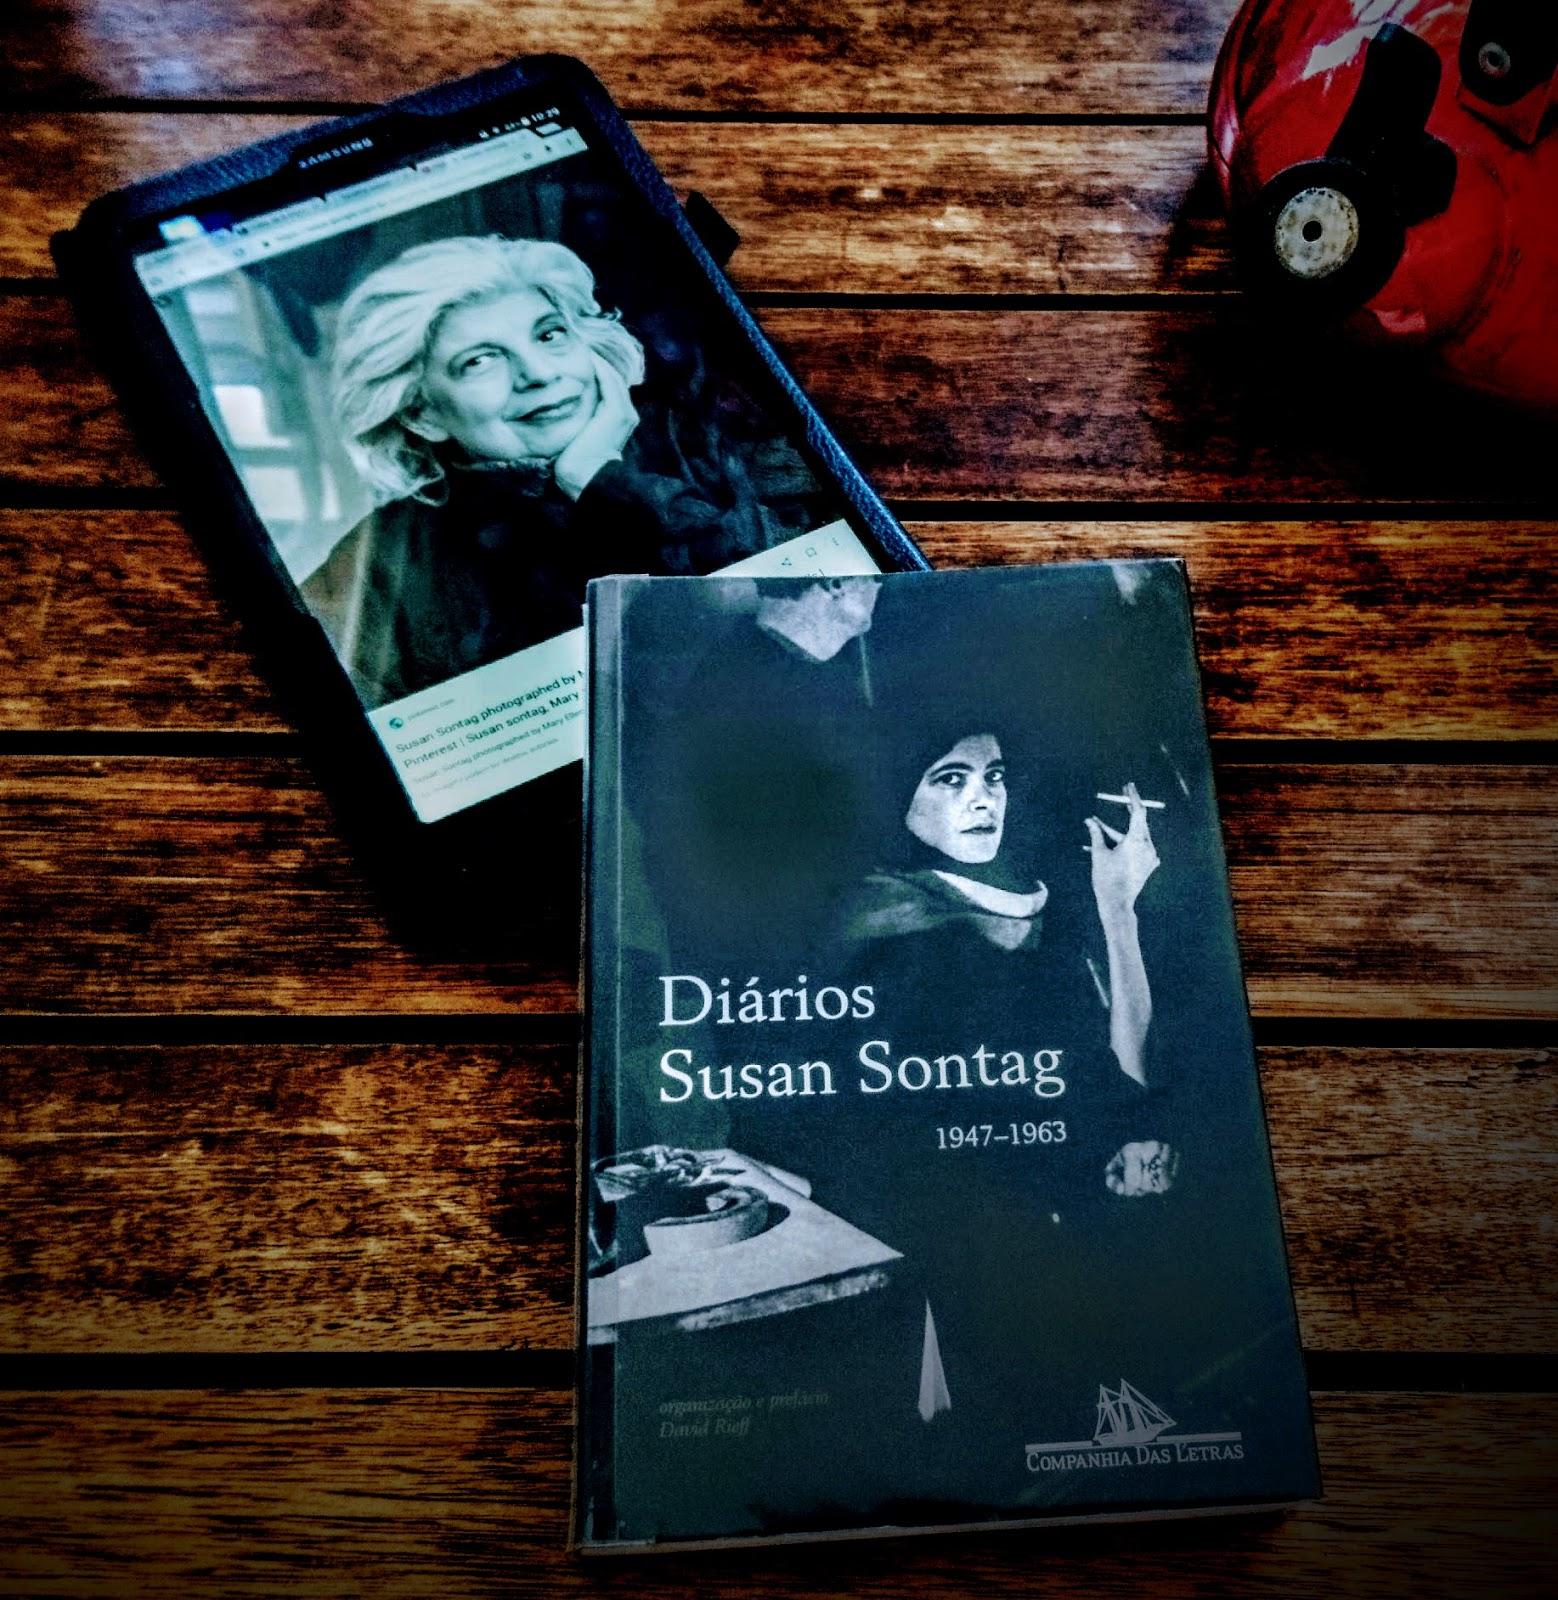 'diários de Susan Sontag'.